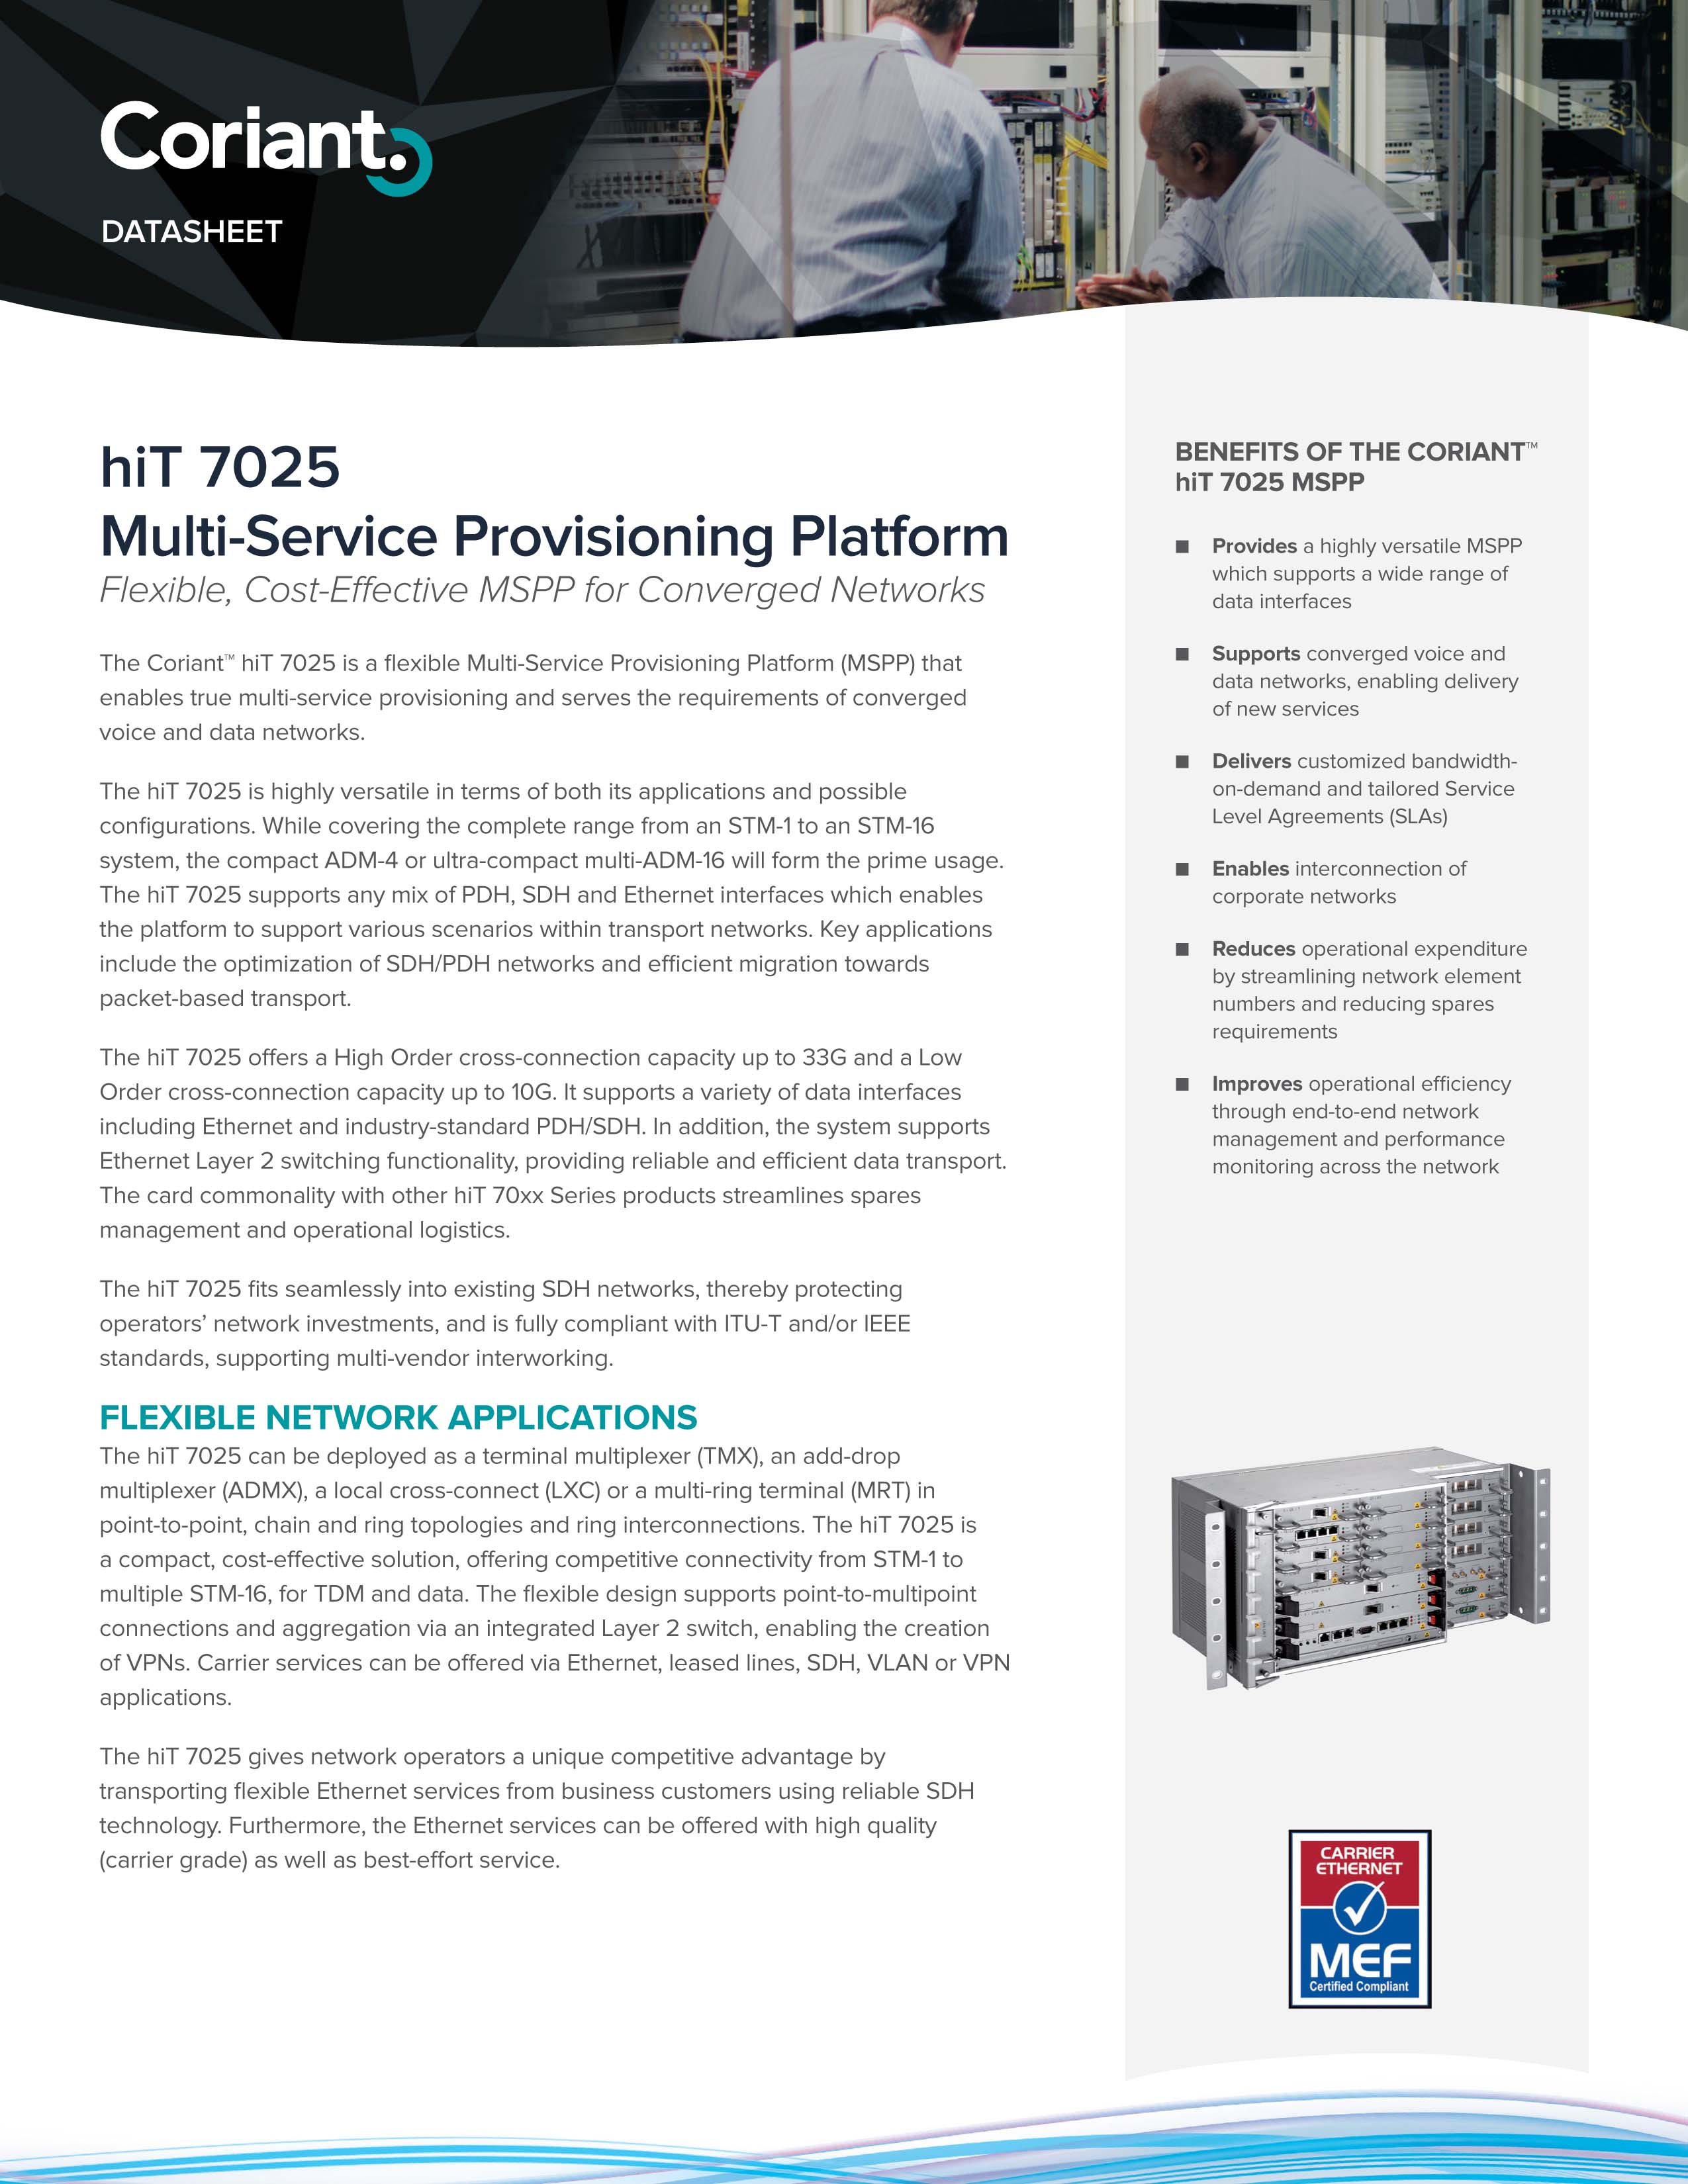 Datasheet - hiT 7025 Multi-Service Provisioning Platform